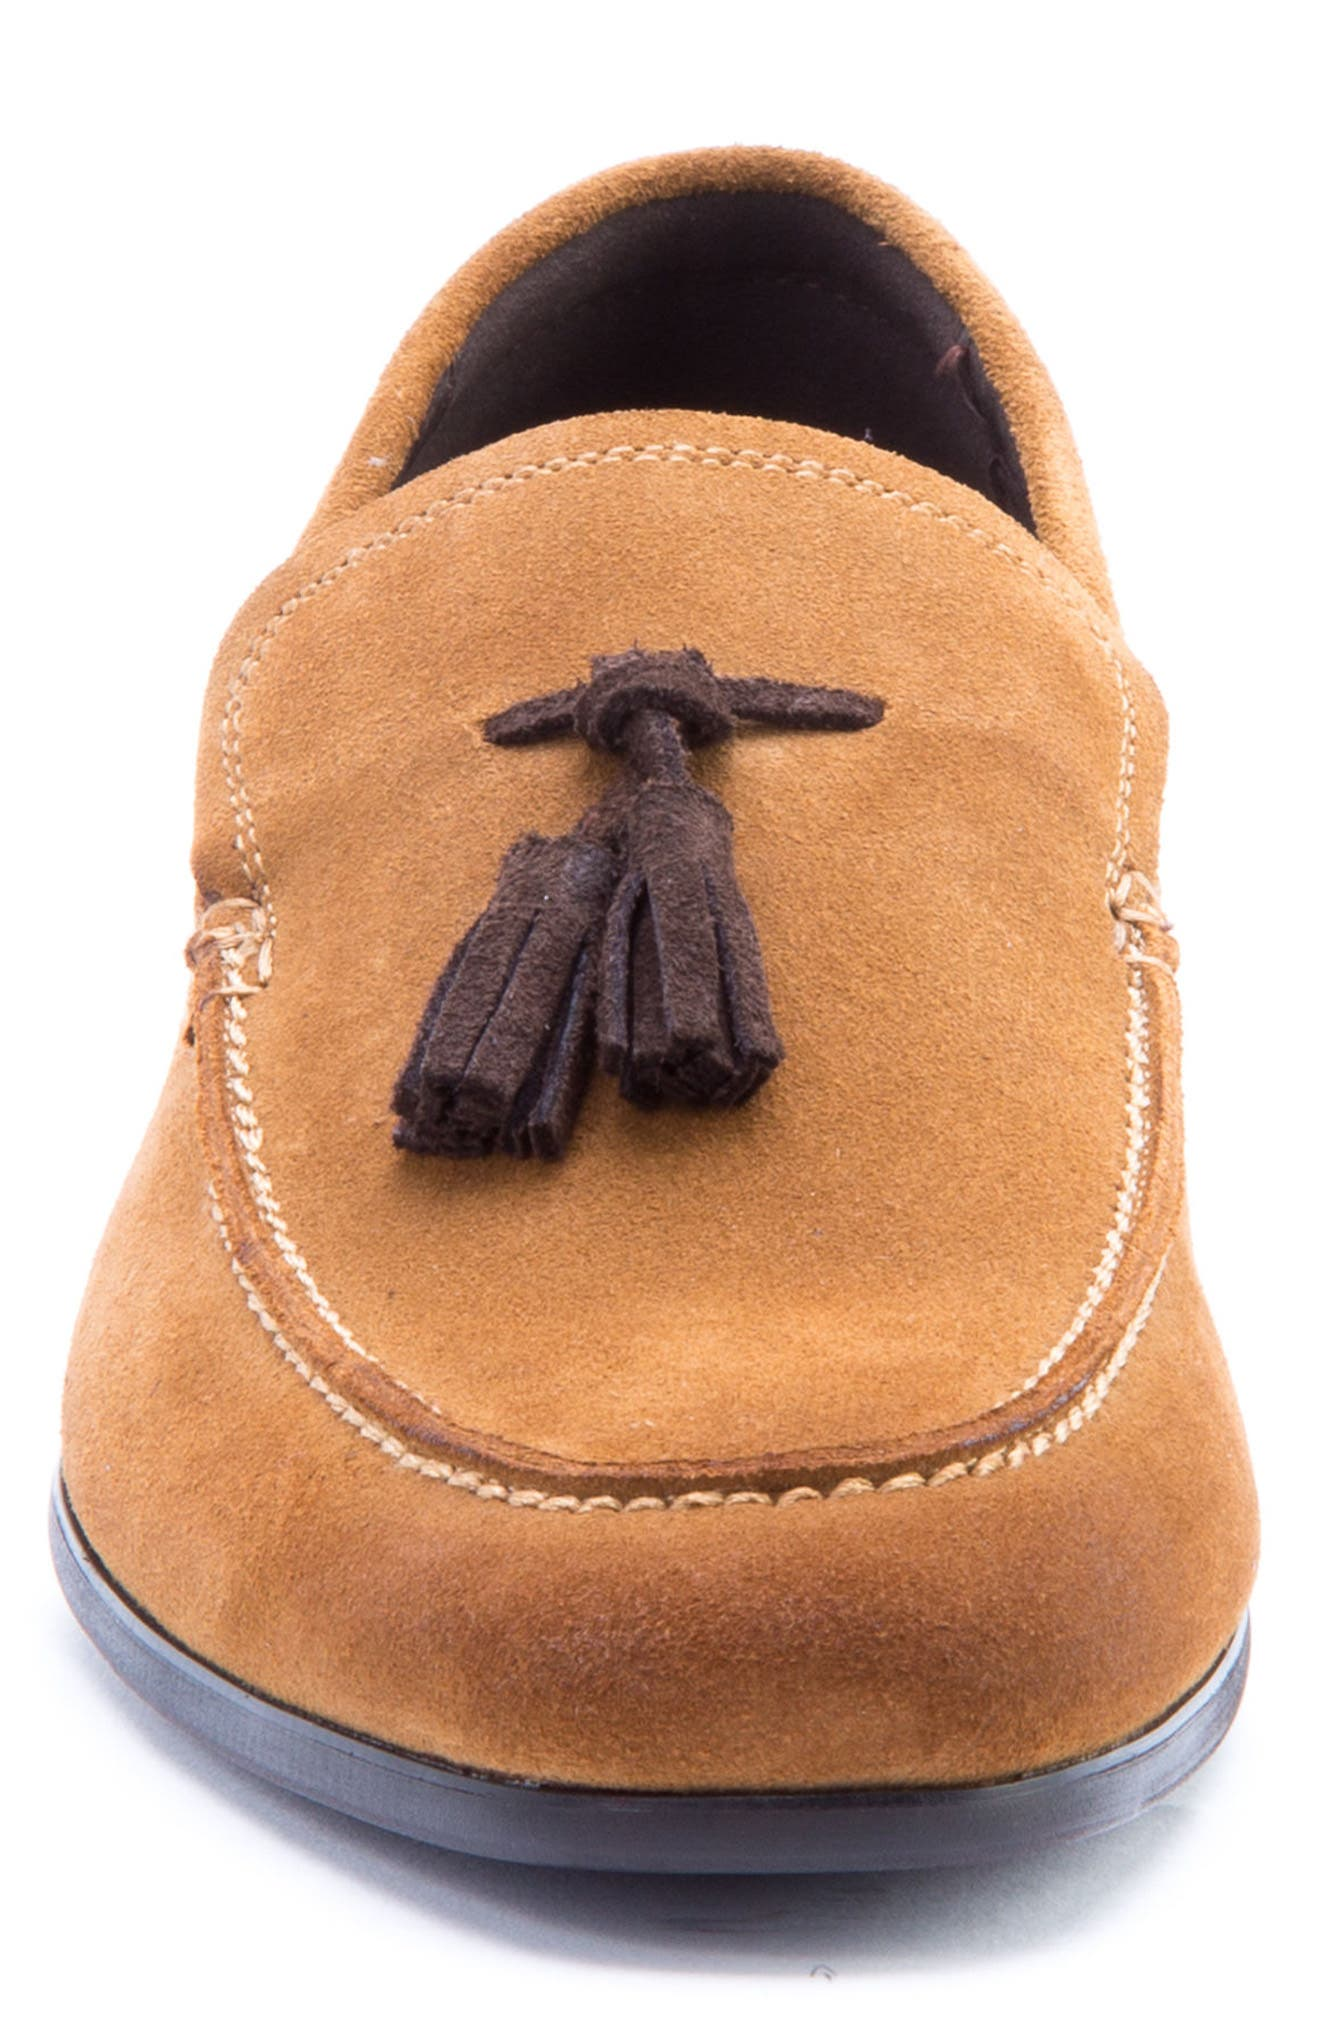 Severn Tassel Venetian Loafer,                             Alternate thumbnail 4, color,                             COGNAC SUEDE